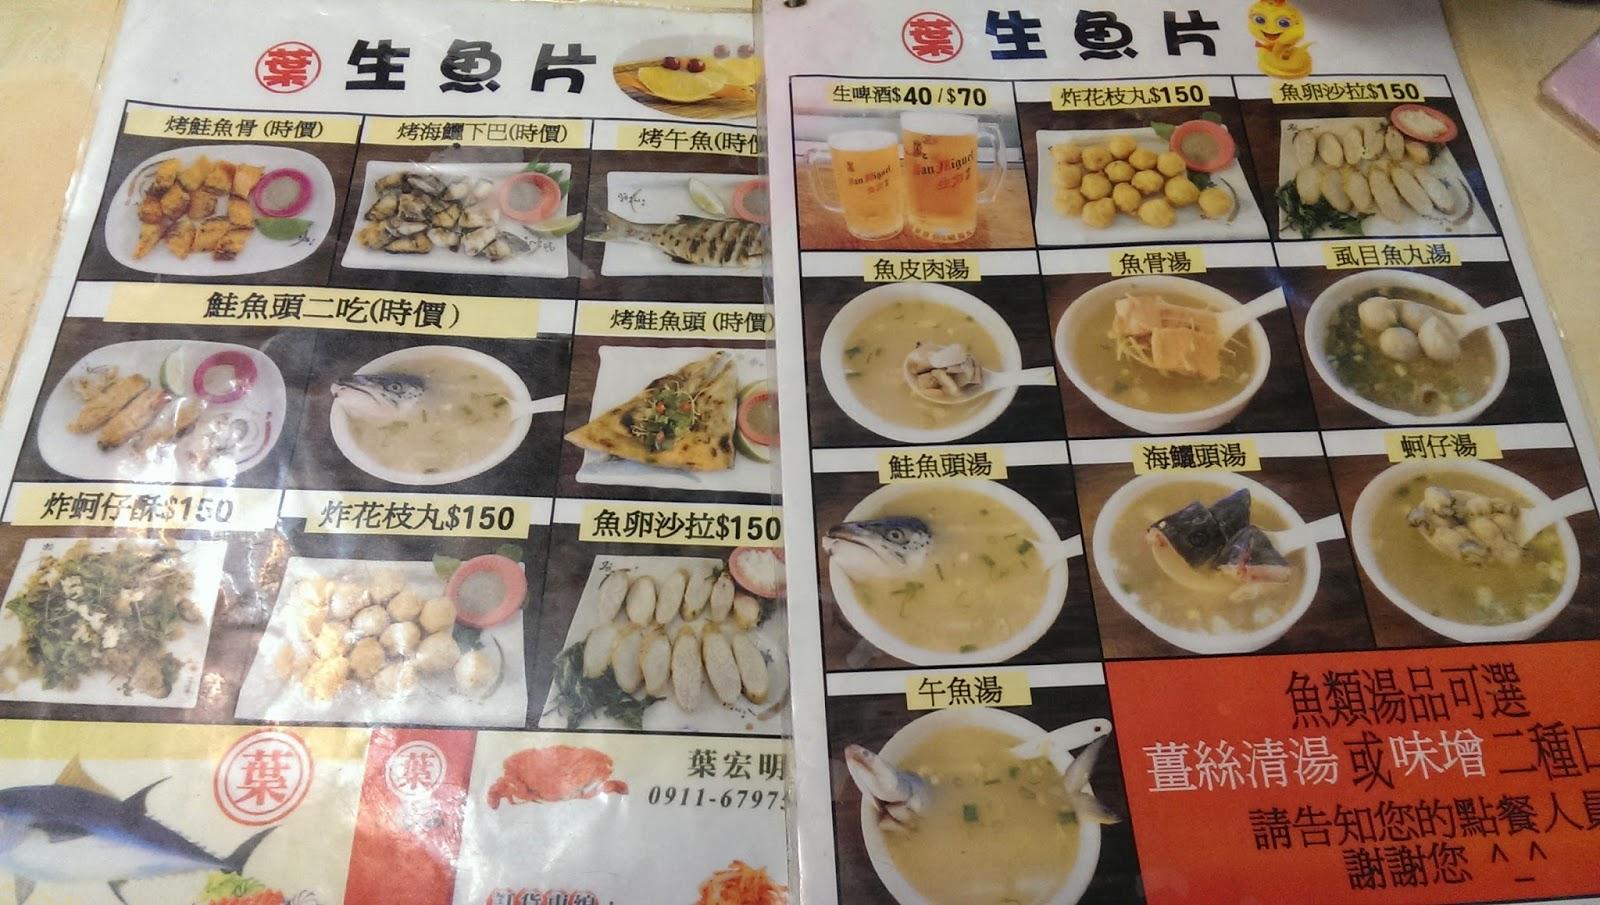 2015 02 02%2B12.02.43 - [食記] 葉家生魚片 - 布袋觀光漁市中的鮮魚餐廳